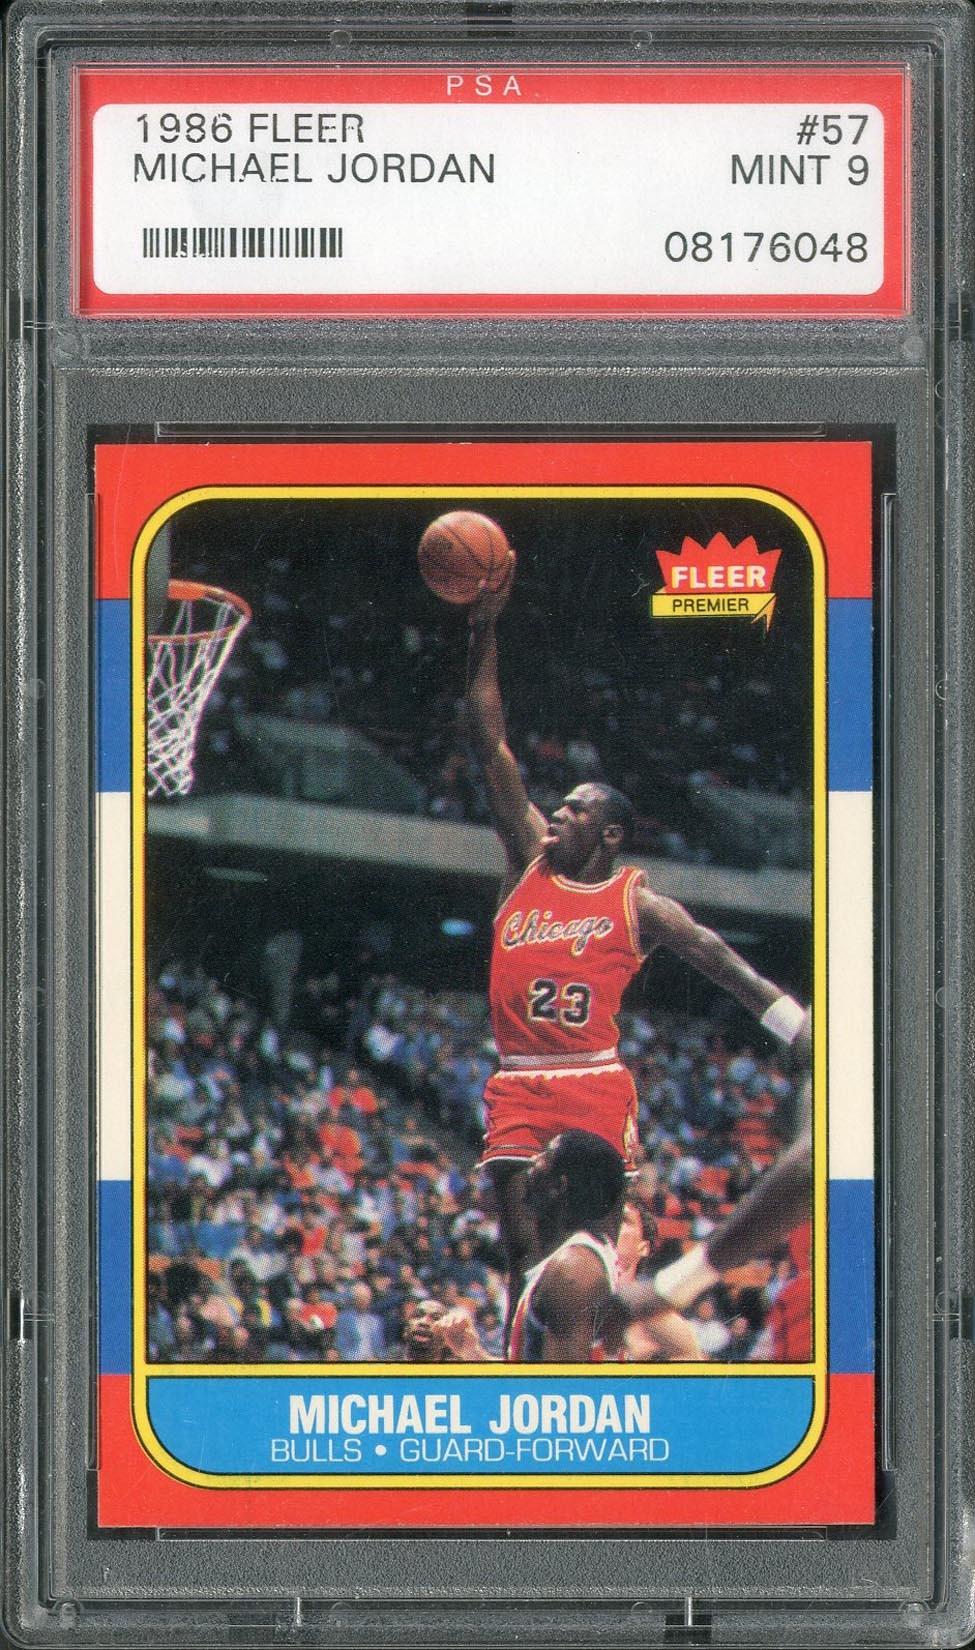 new style ba156 bf6bd 1986 Fleer Michael Jordan  57 Rookie PSA MINT 9